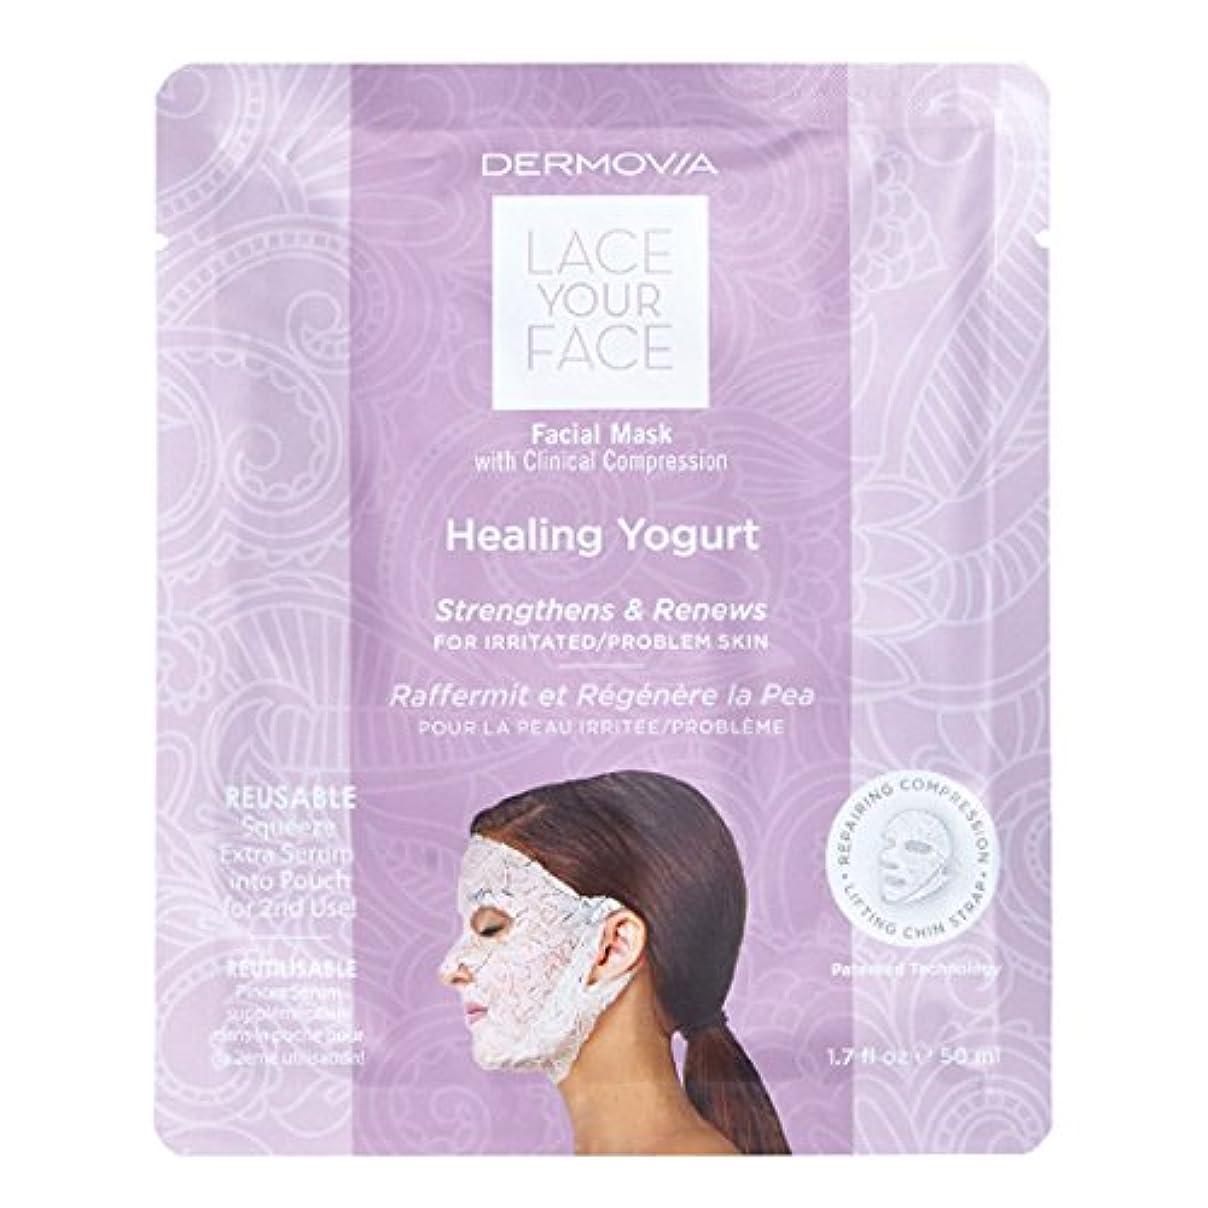 LACE YOUR FACE Compression Facial Mask - Healing Yogurt Milk - Single dsjvu078297